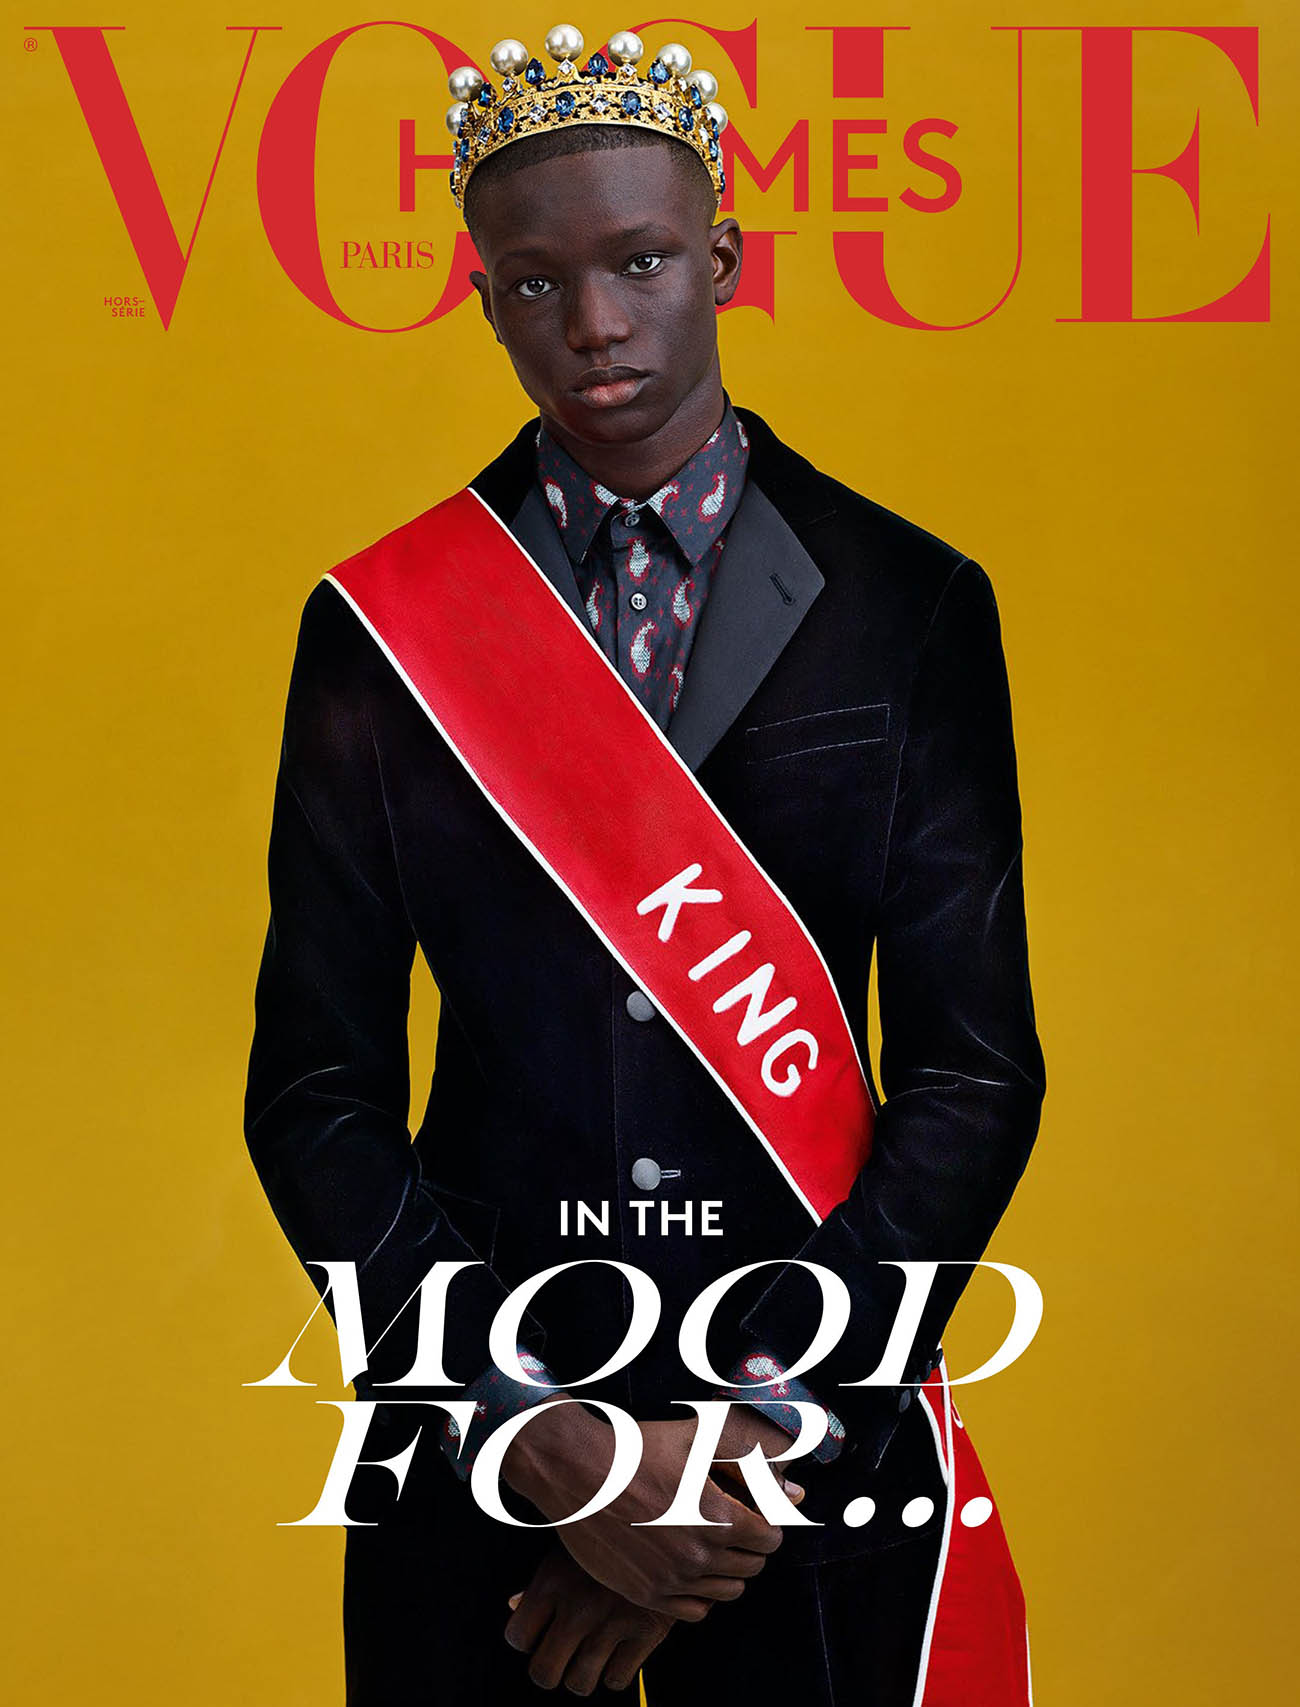 Mahamadou Diaoune covers Vogue Hommes Paris Fall Winter 2020 by Craig McDean